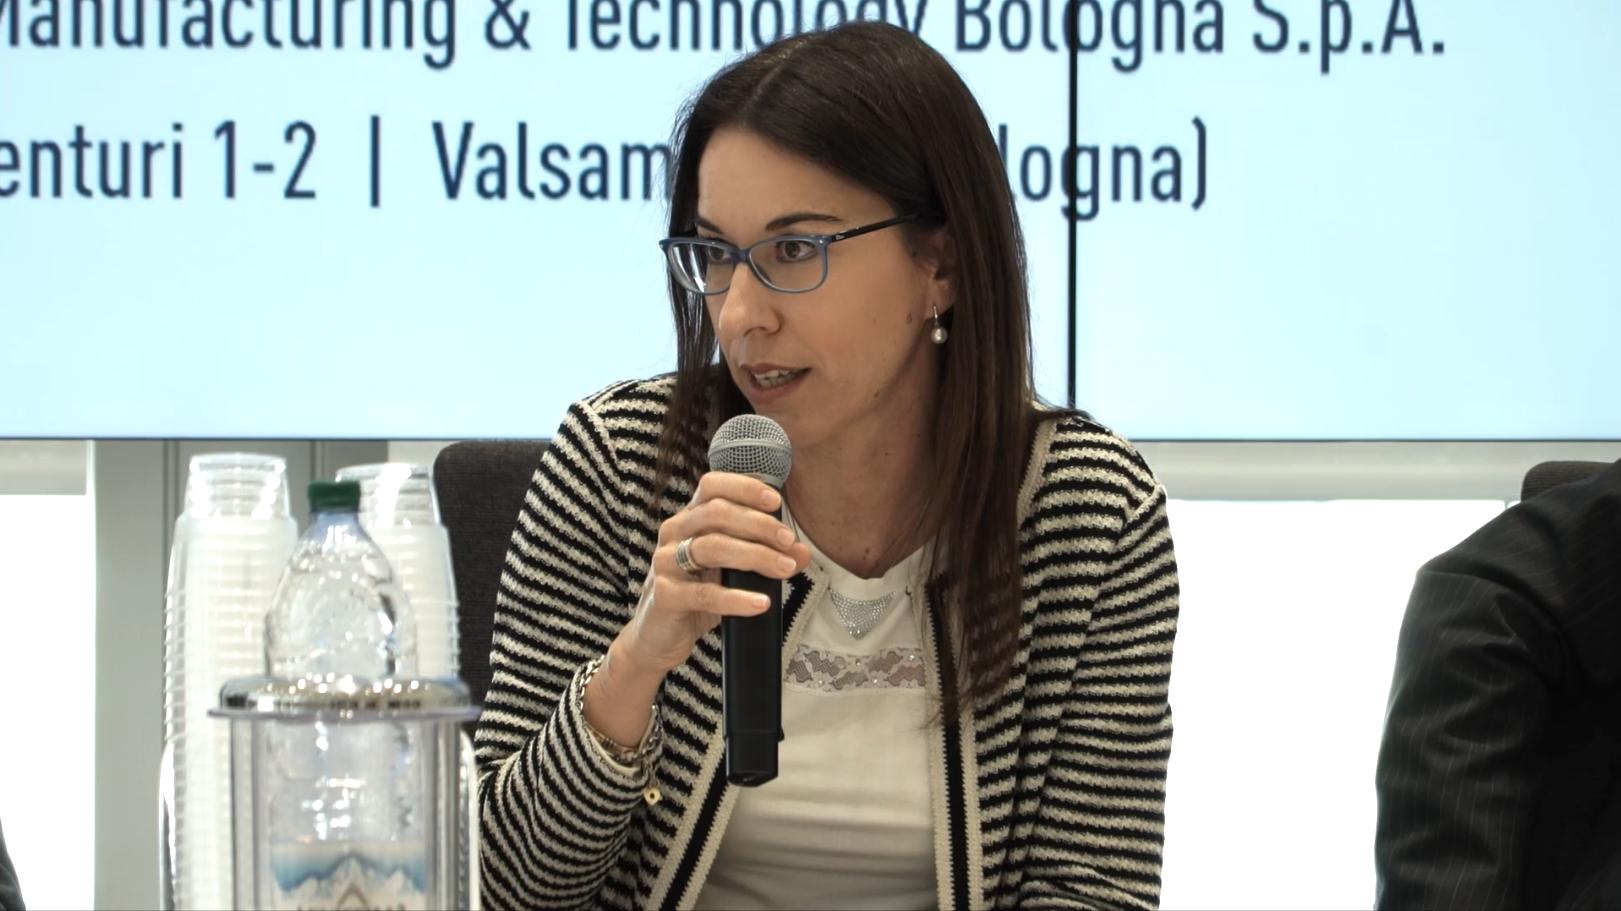 Cristiana D'Agostini, Director Organizational Development and Internal Communicatione, COESIA